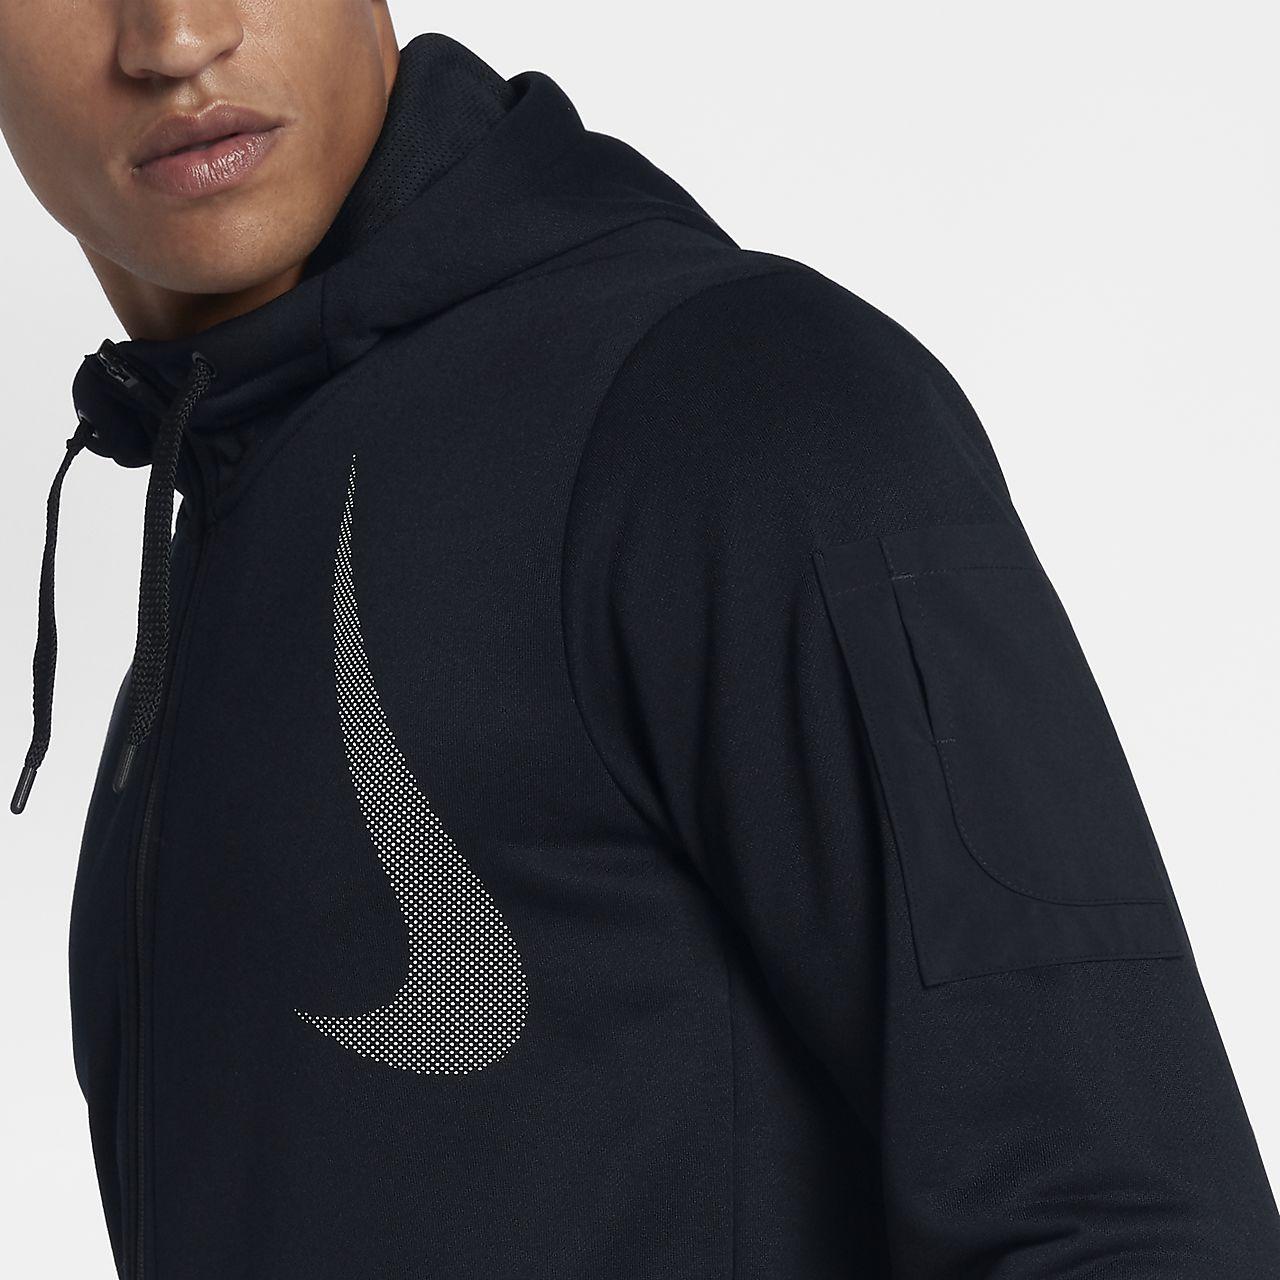 ... Nike Dri-FIT Men's Training Hoodie